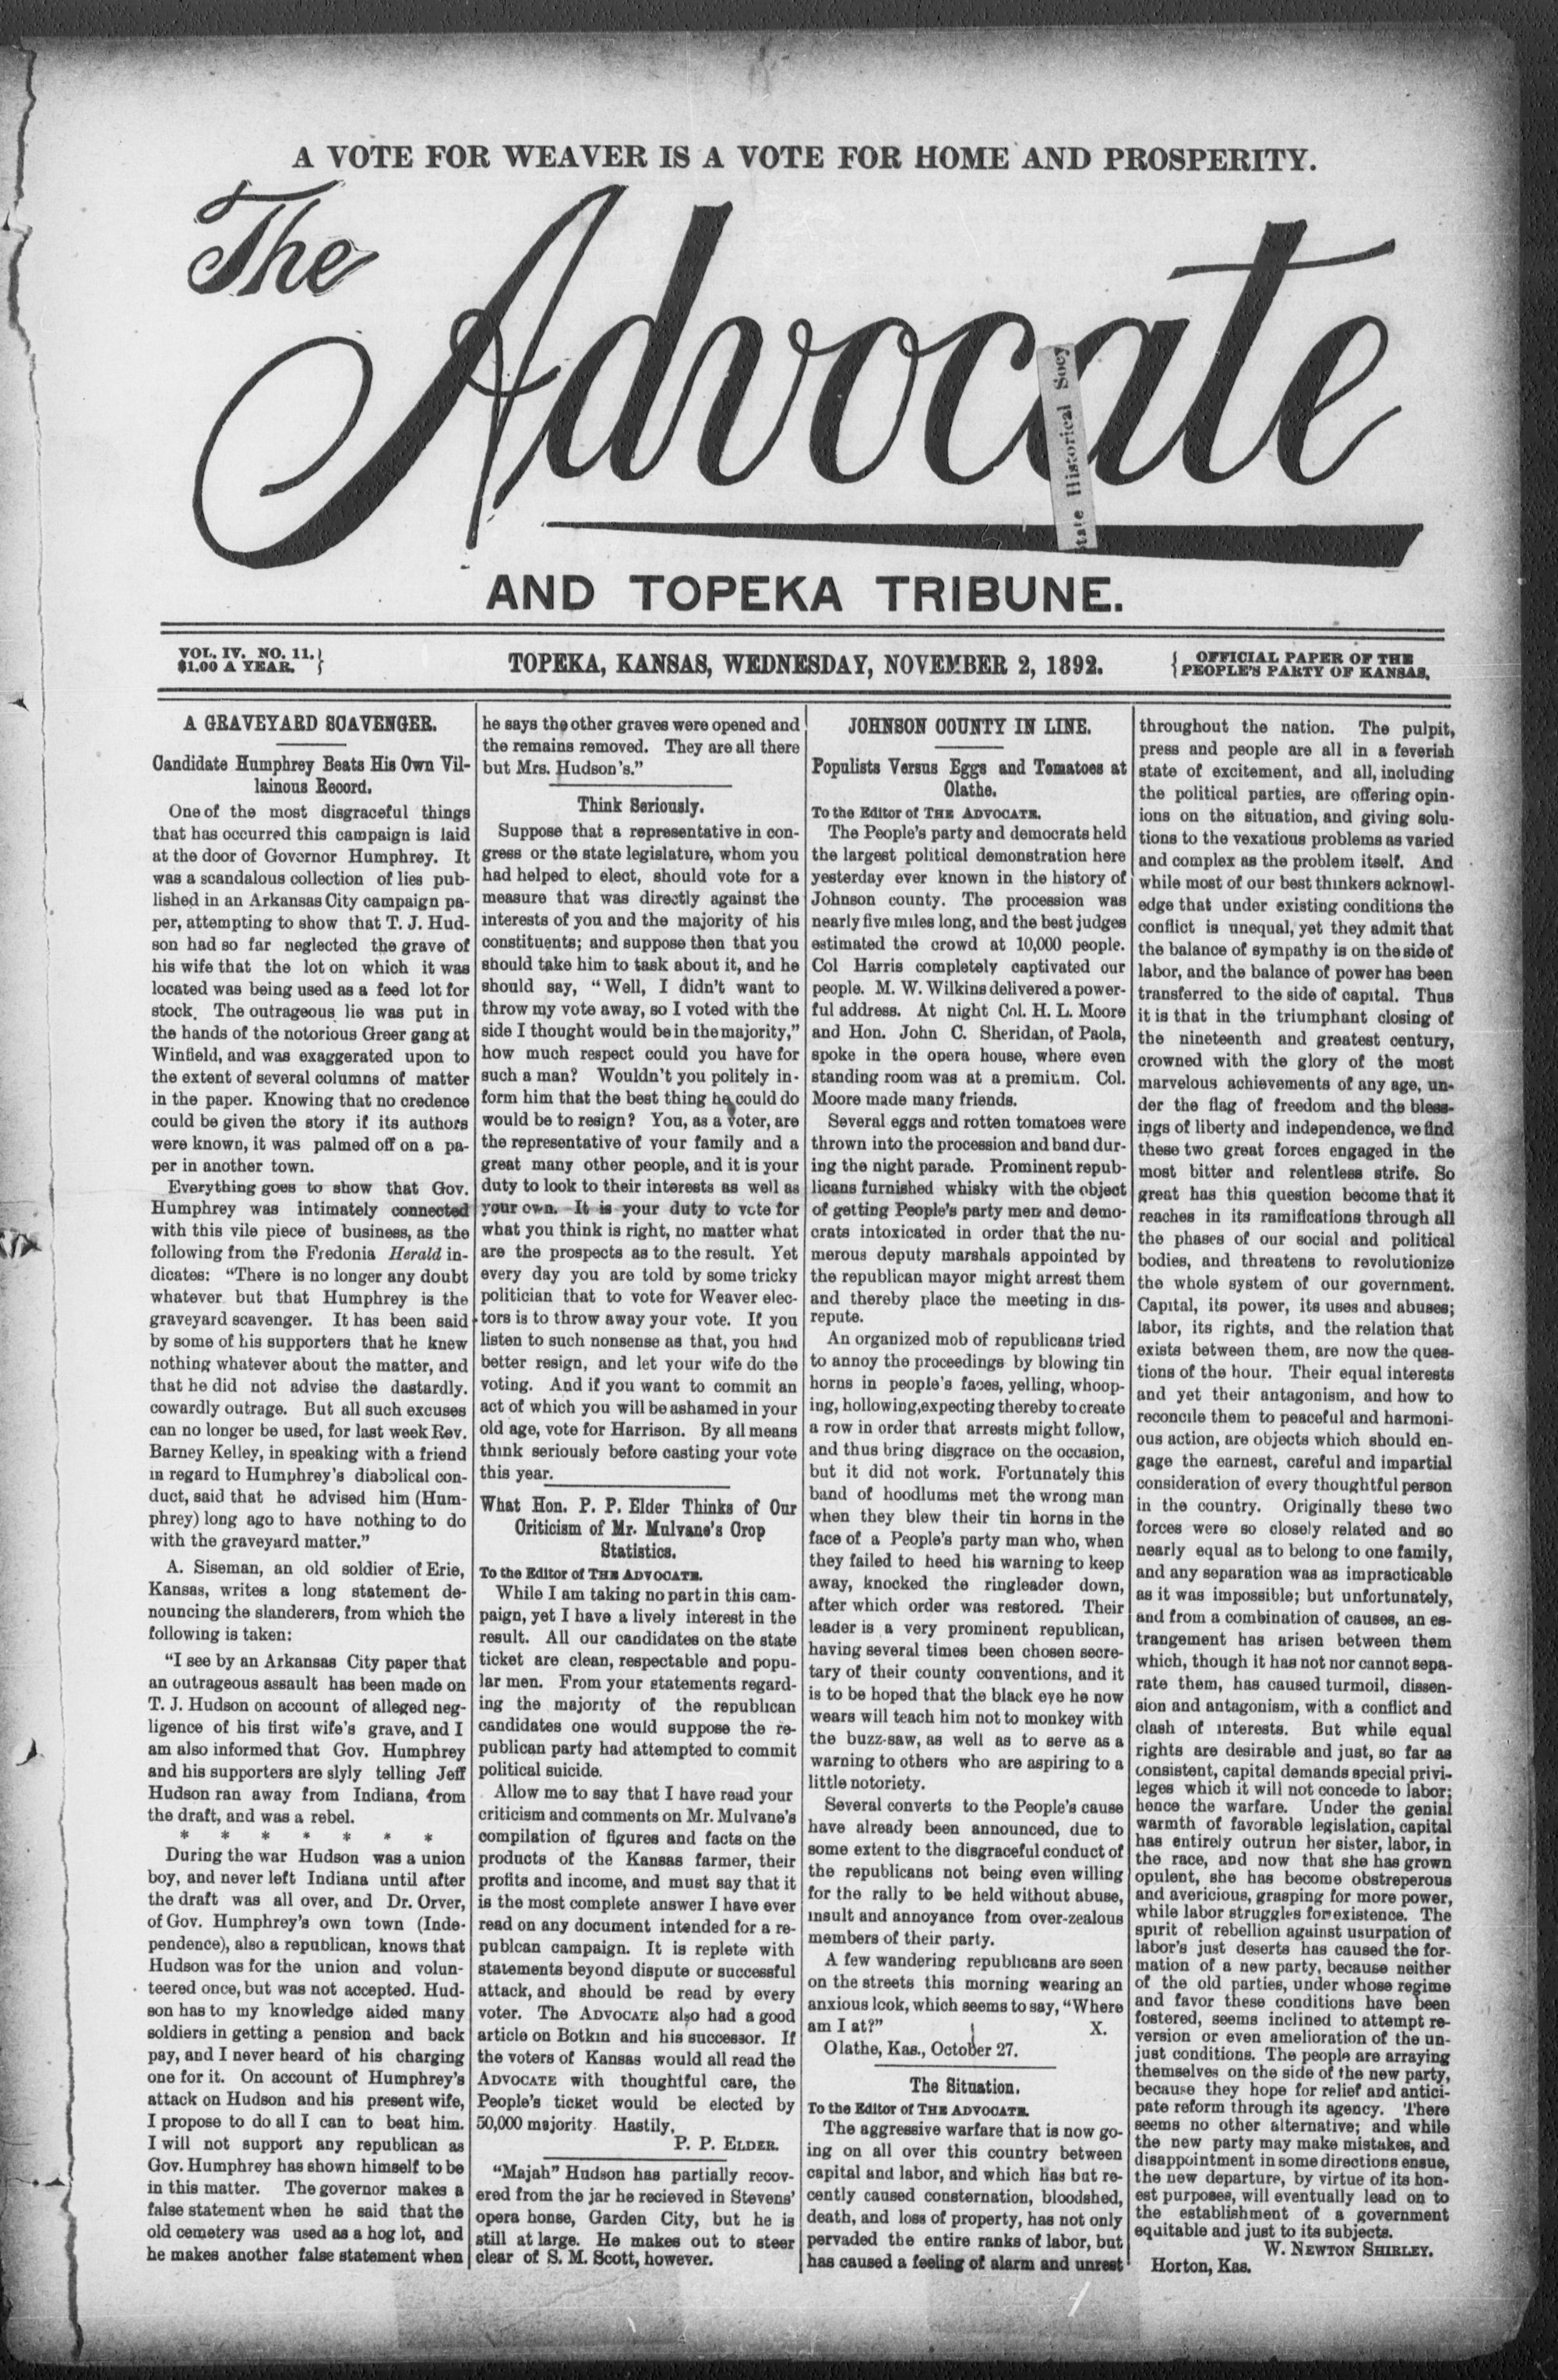 The Advocate and Topeka Tribune